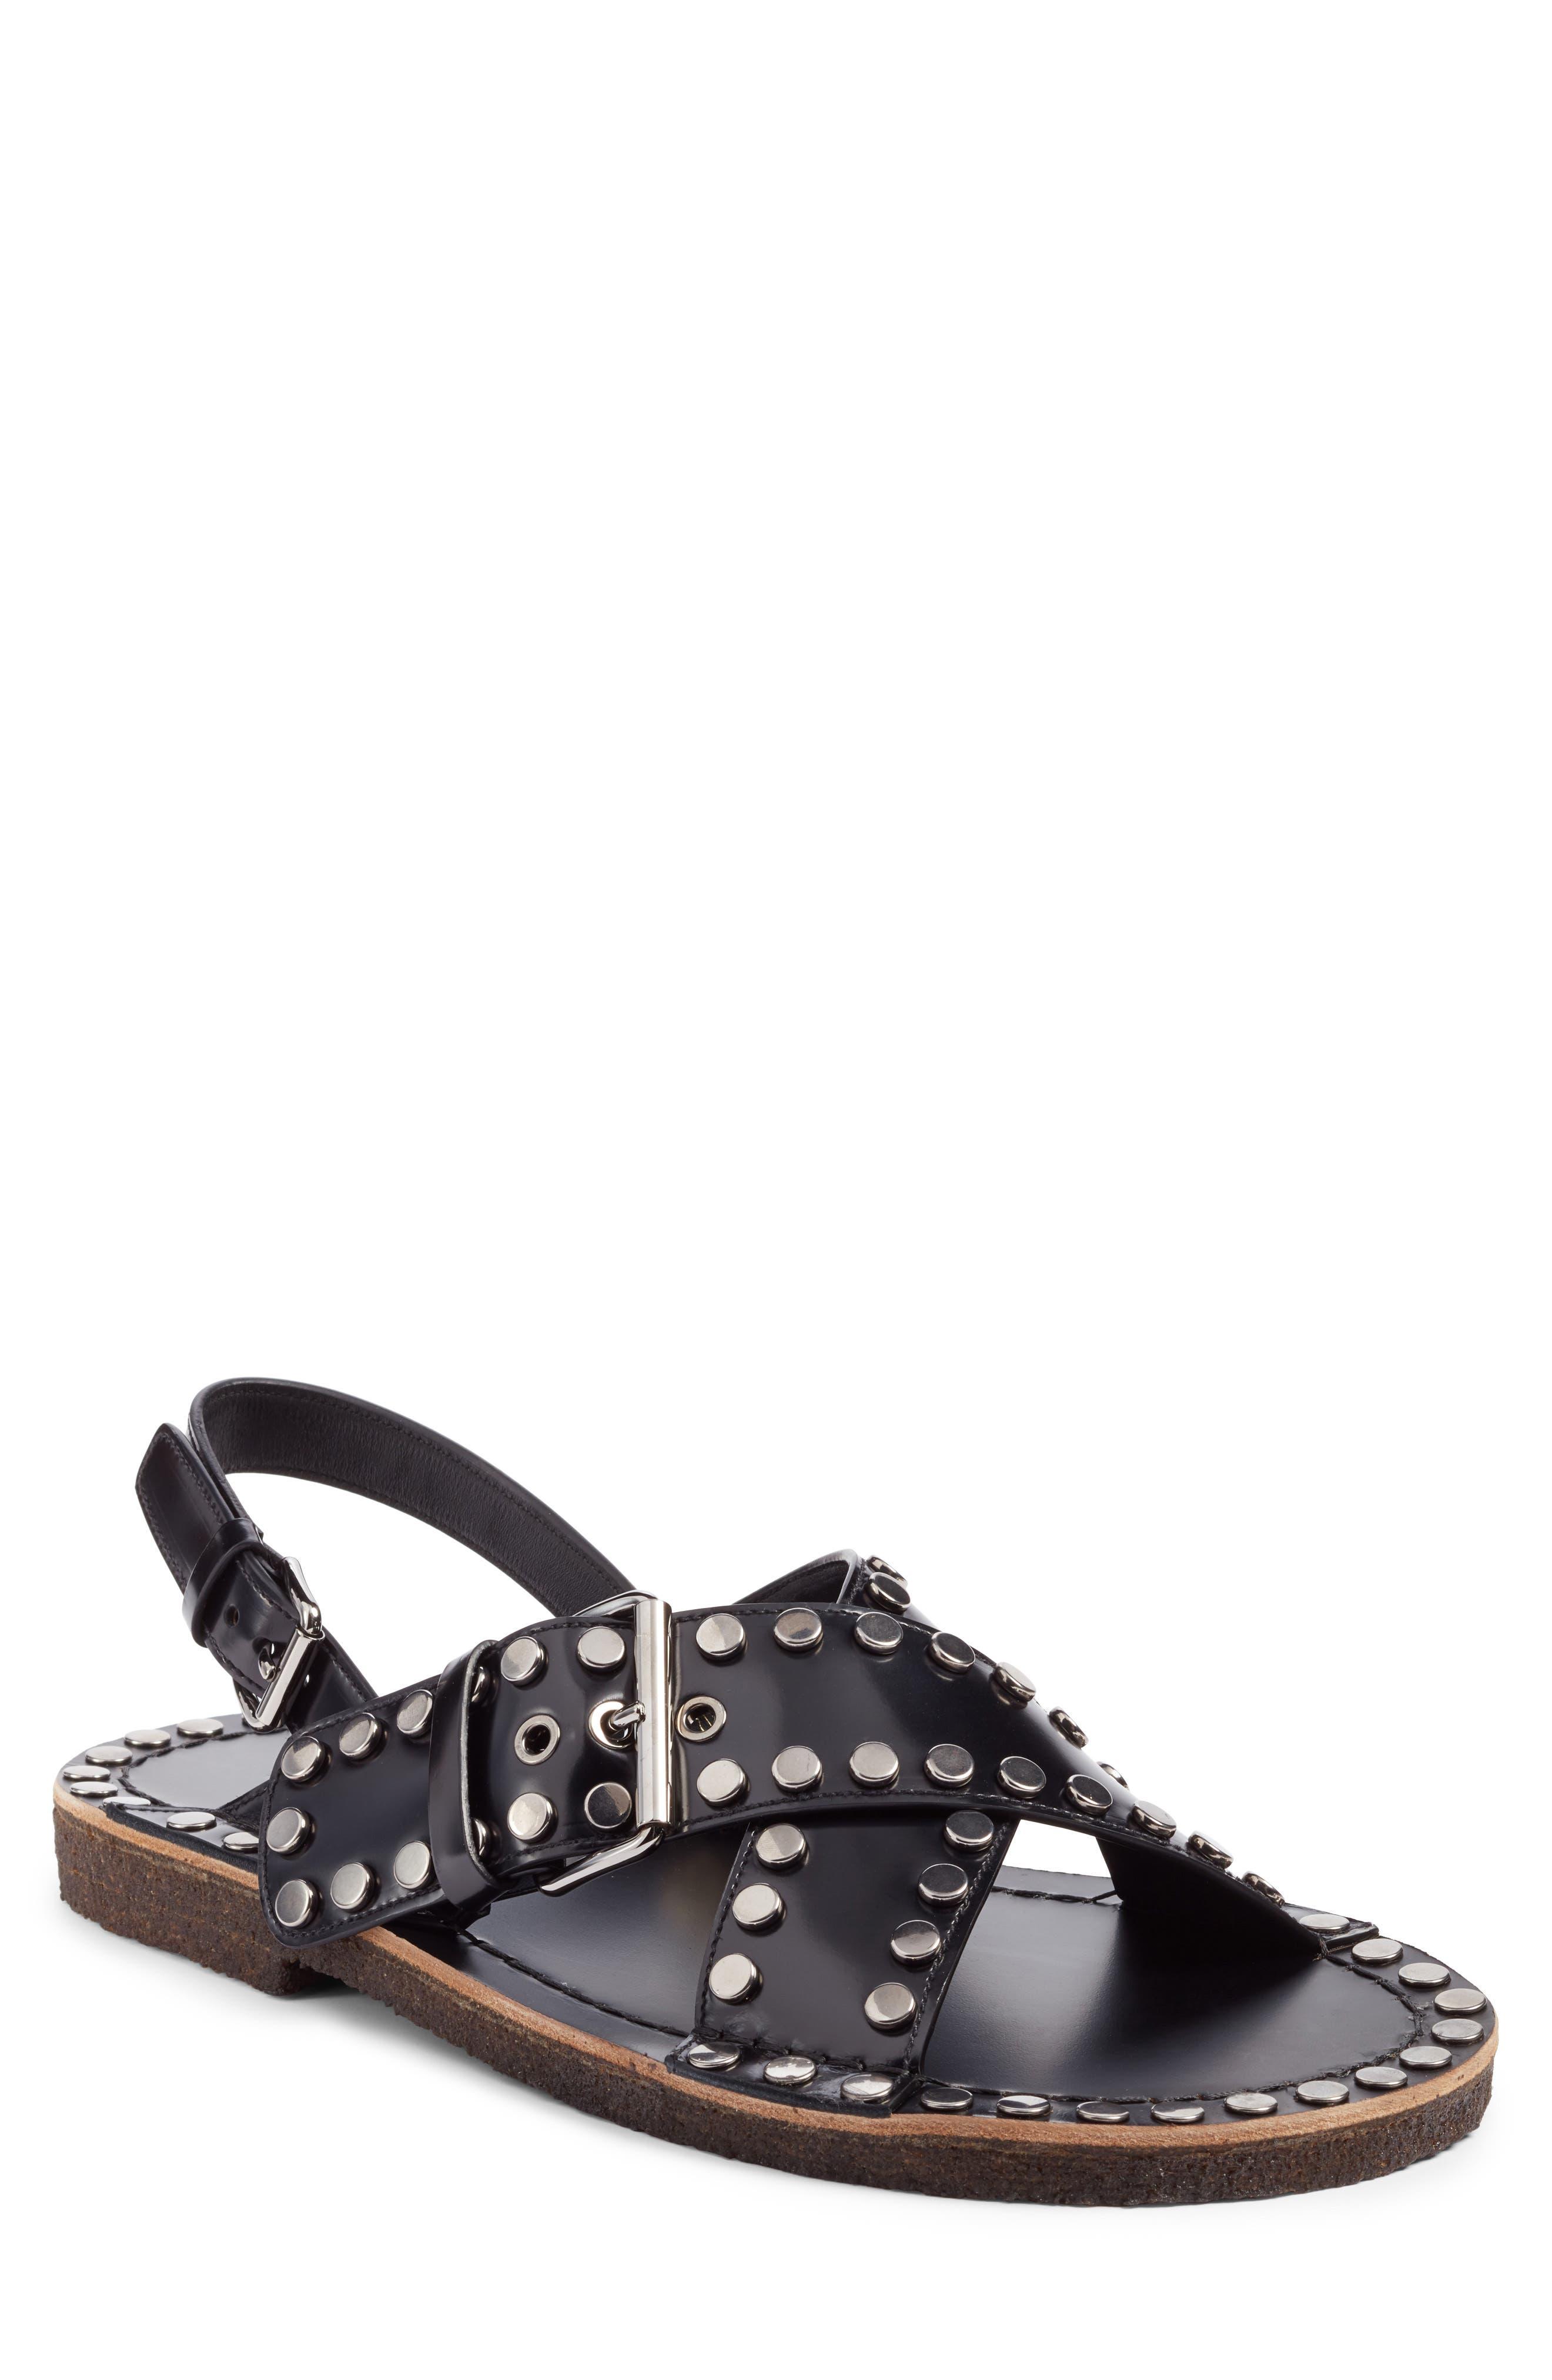 Crisscross Sandal,                             Main thumbnail 1, color,                             Nero Leather